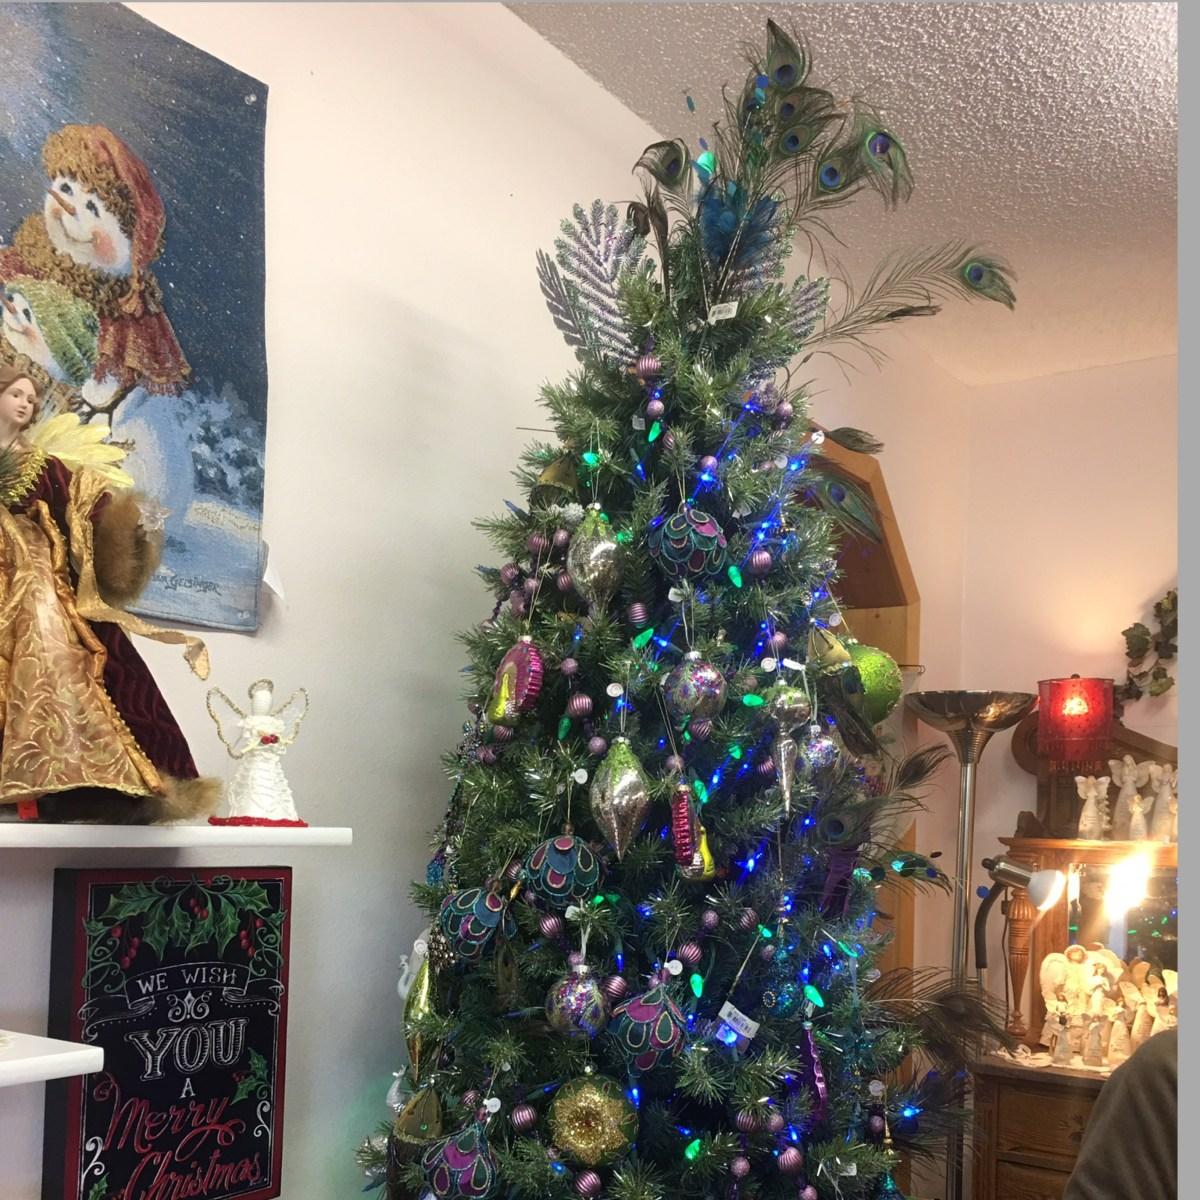 Peacock Themed Christmas Tree at Christmas Village